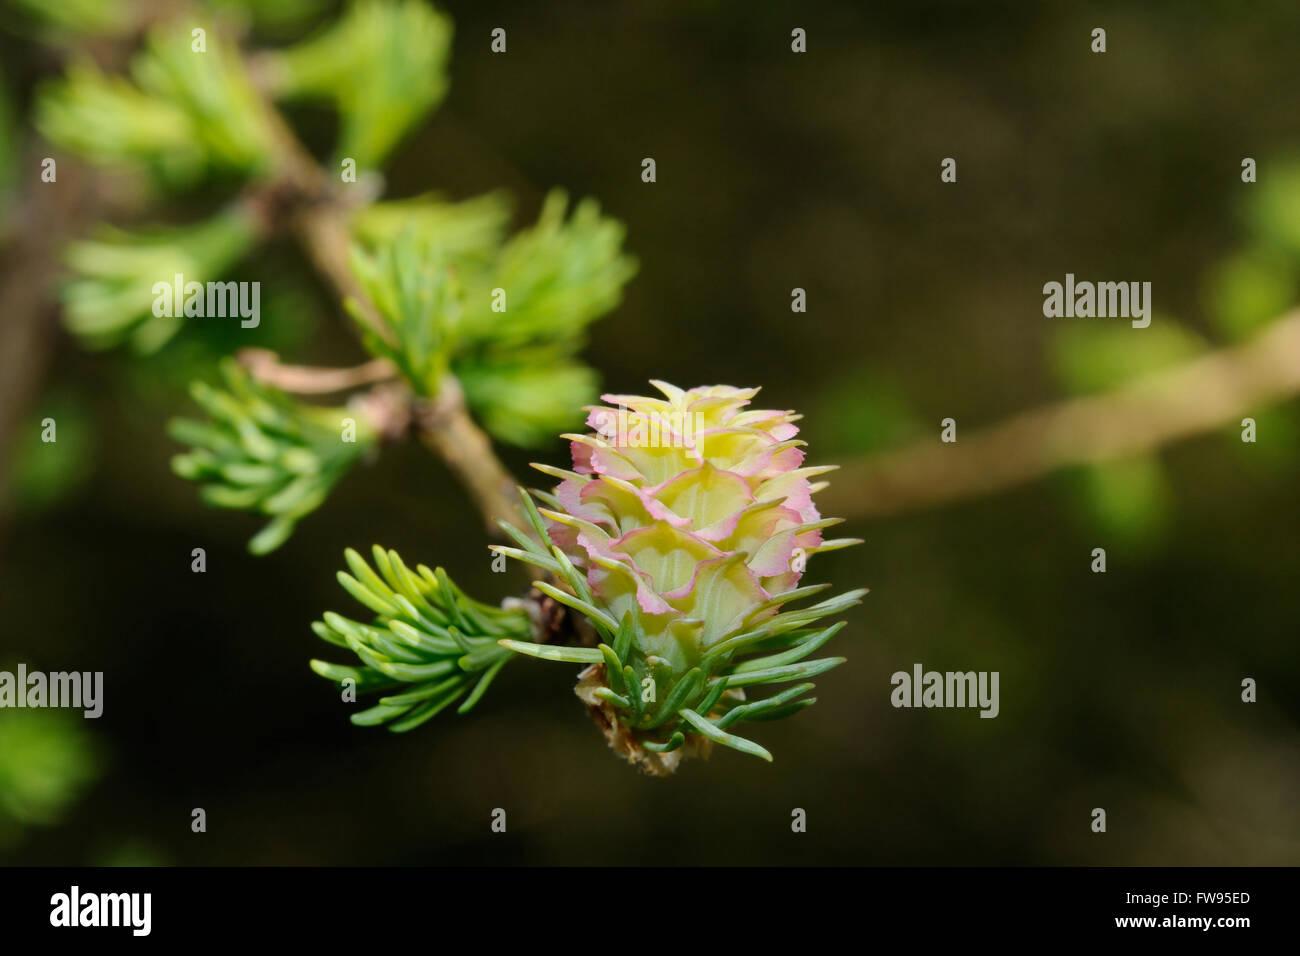 A close up shot of a larch tree blossom, Puumala, Finland - Stock Image